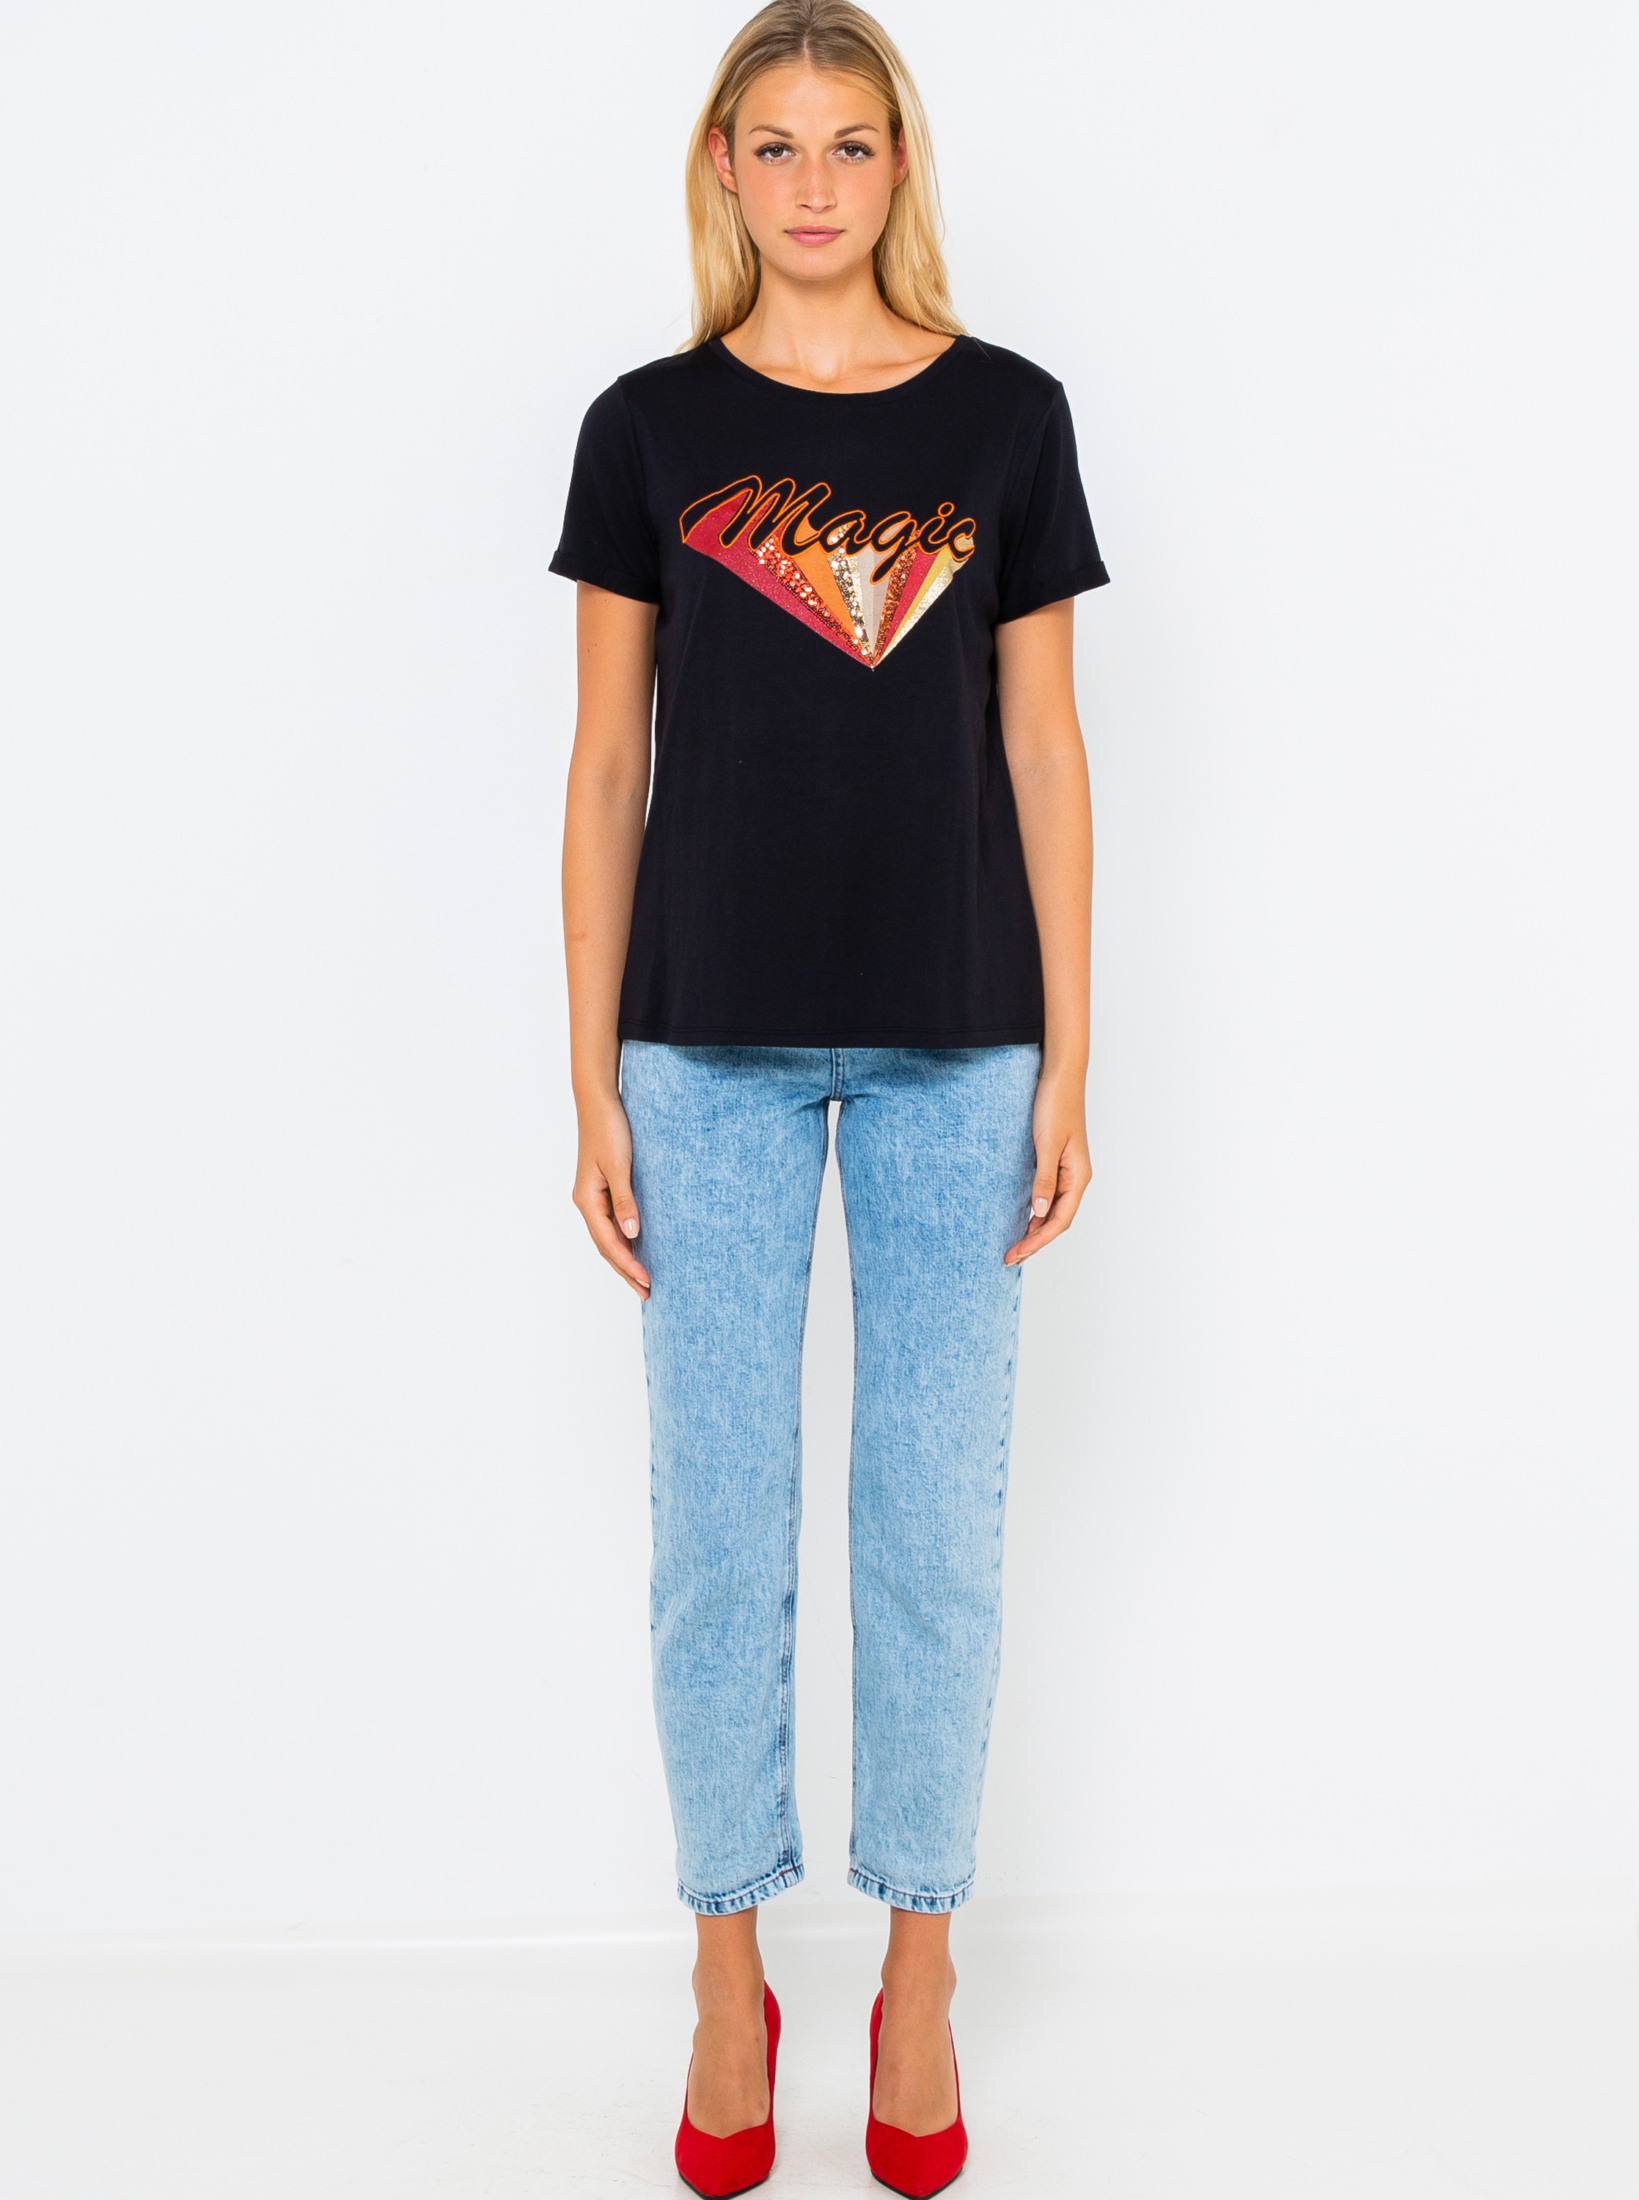 CAMAIEU nero da donna maglietta con stampa